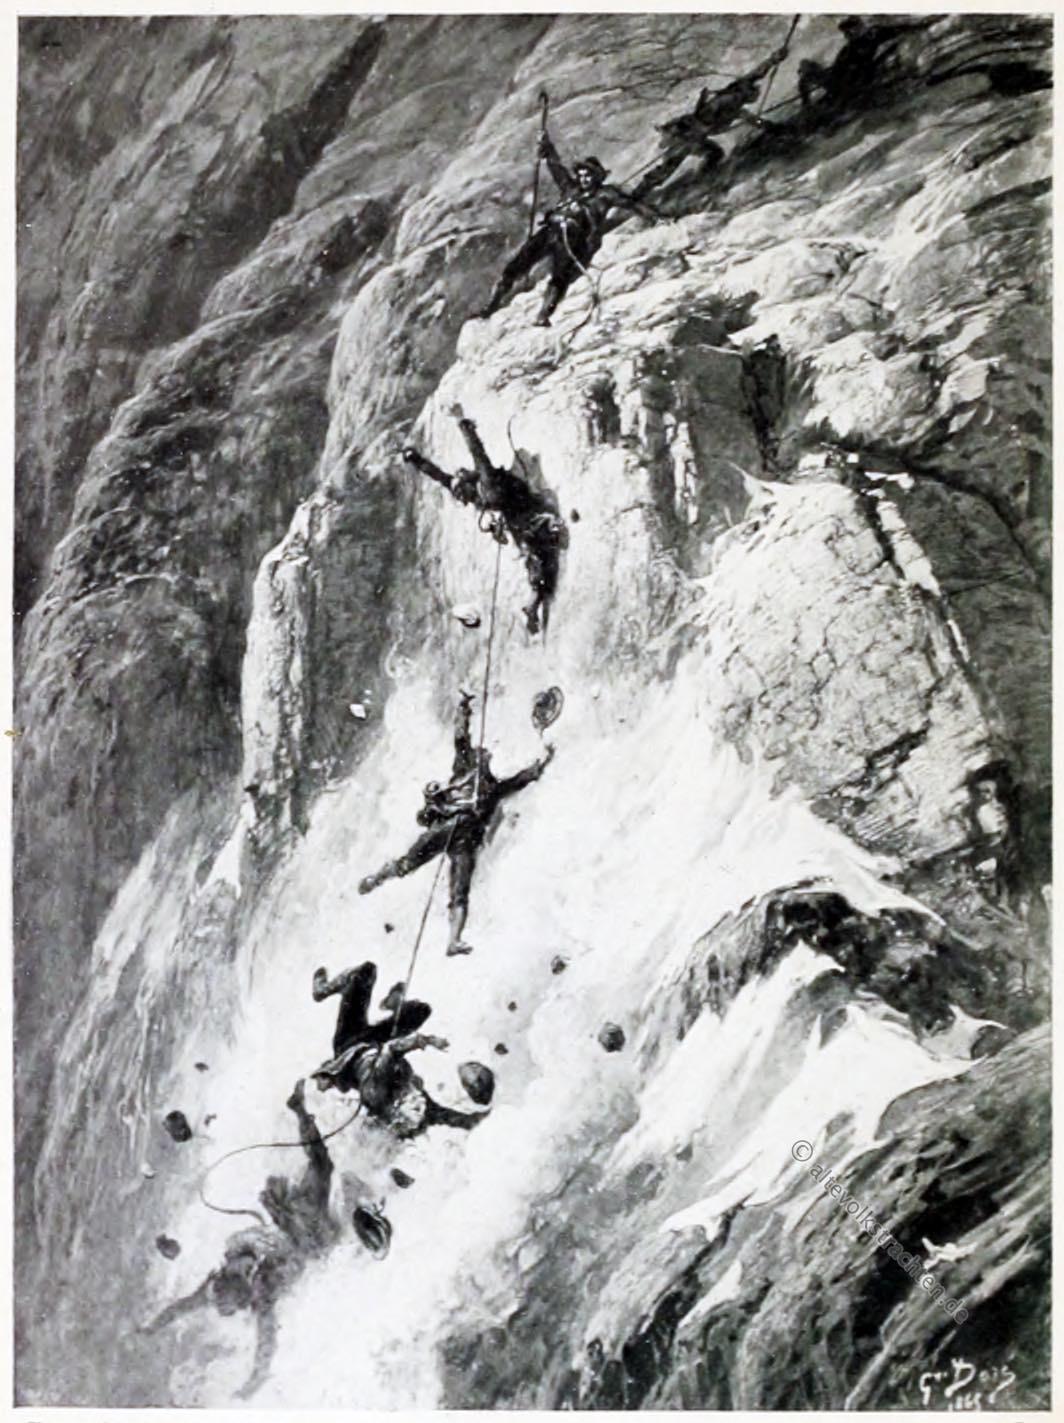 Tragödie, Matterhorn, Doré, Whymper